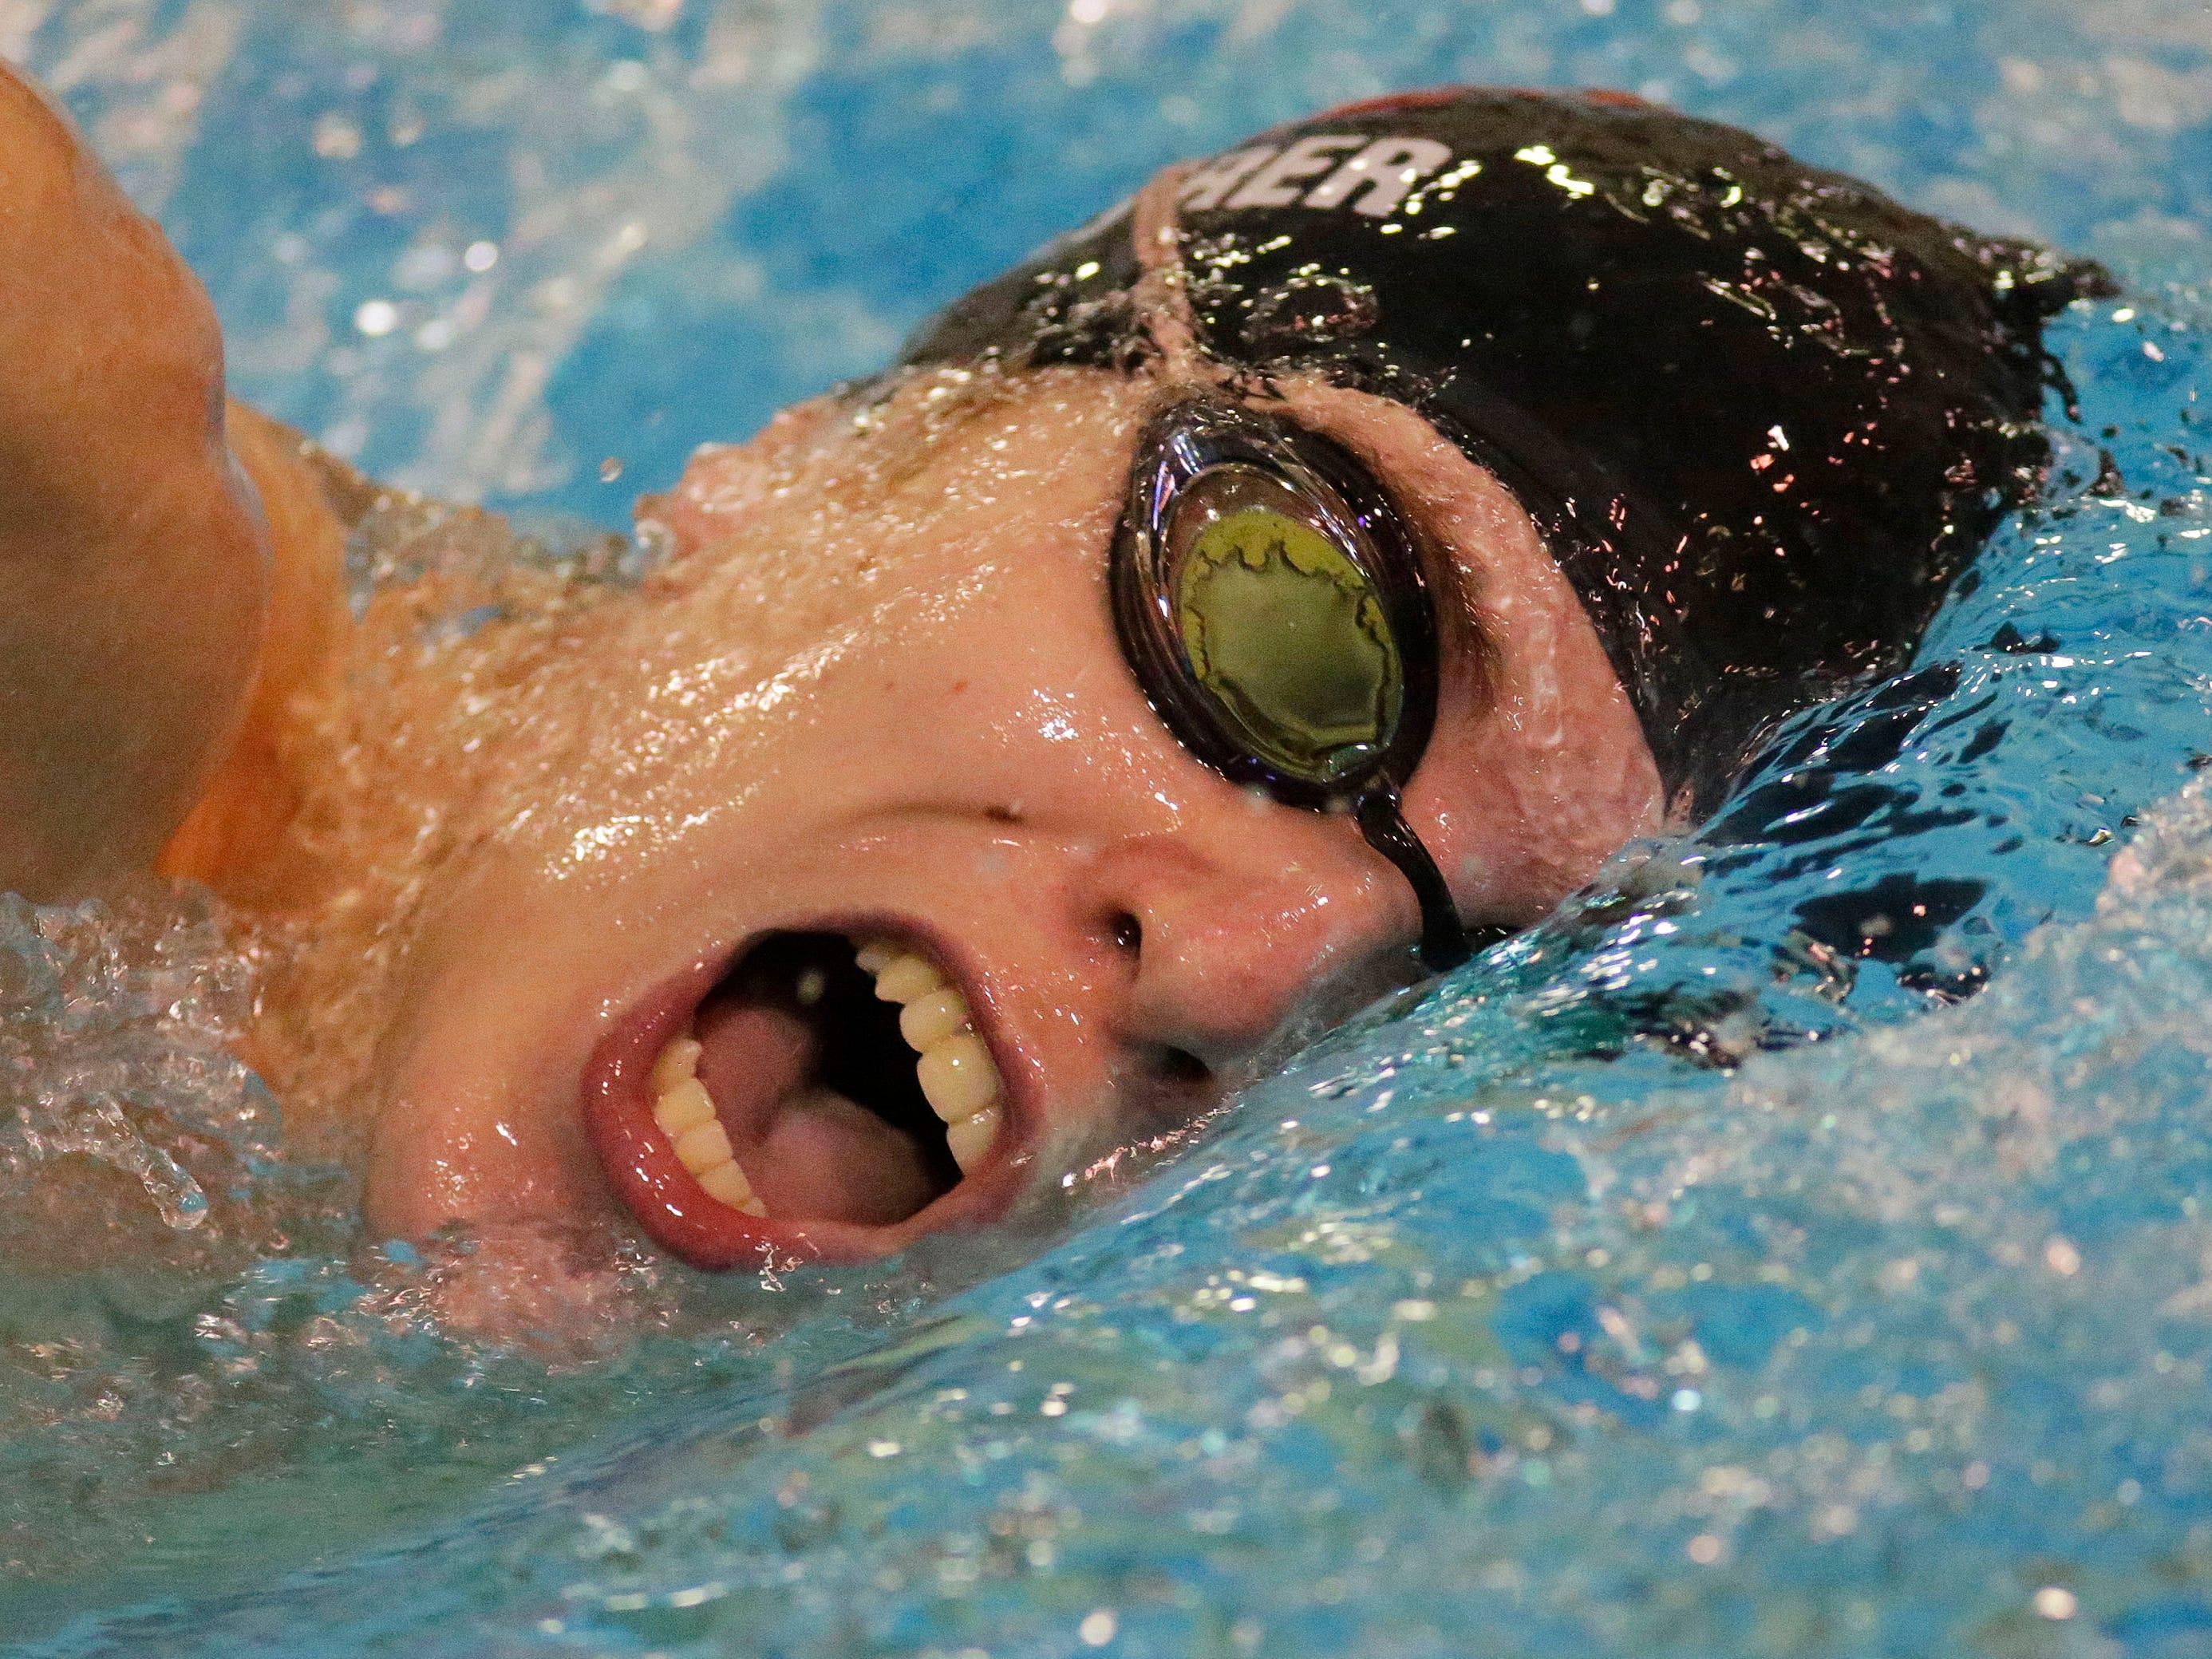 Manitowoc's Gavin Maurer swims the 750 yard freestyle at the Sheboygan North Raider Relays, Saturday, January 5, 2019, in Sheboygan, Wis.